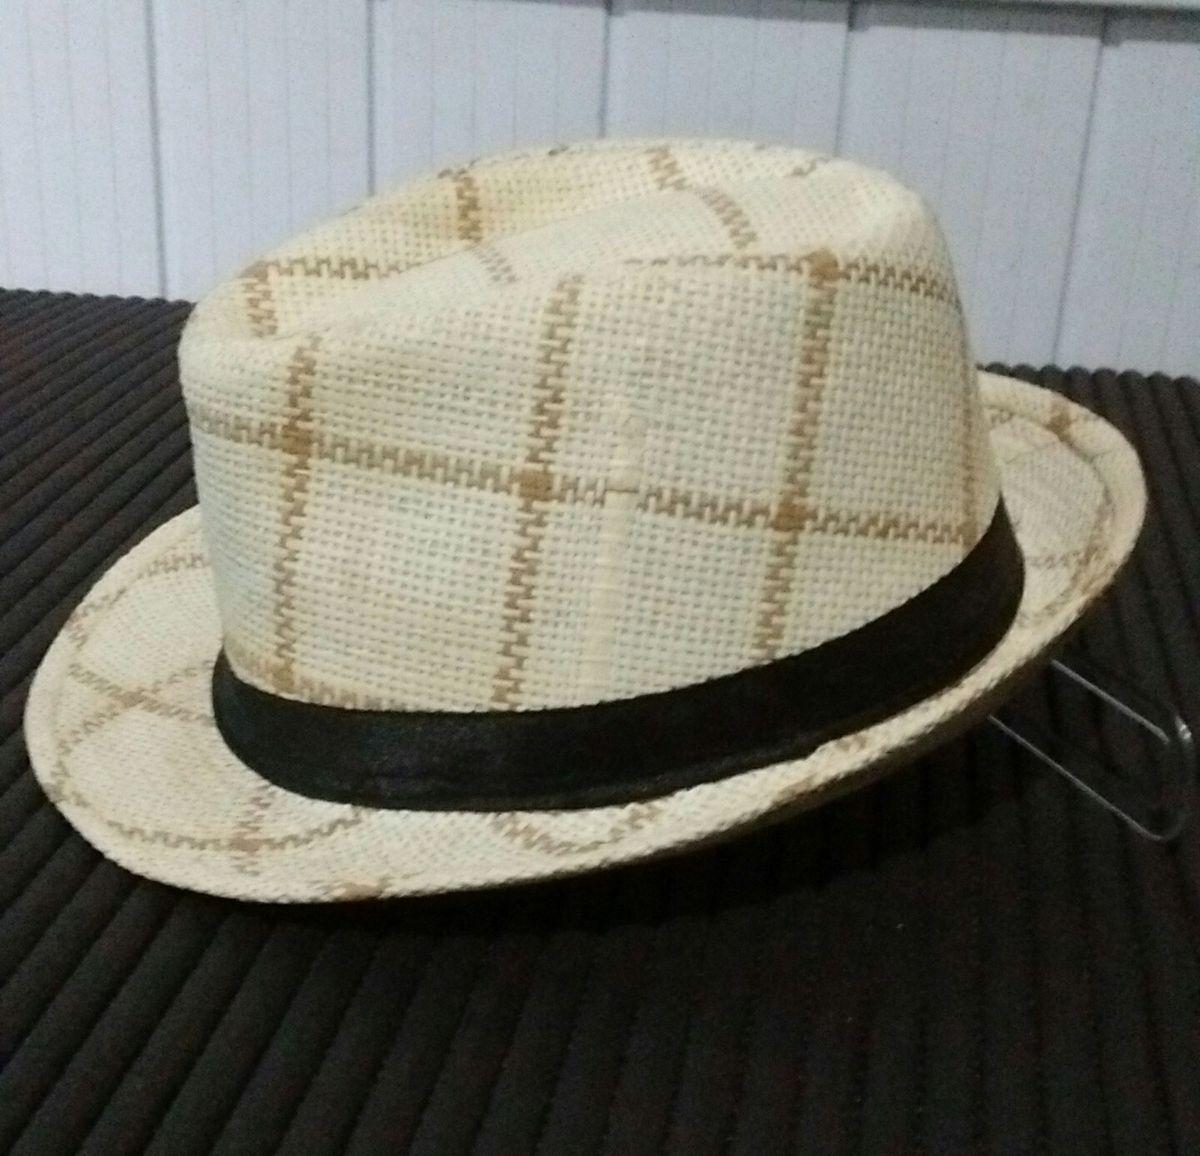 chapéu xadrez - chapeu importado.  Czm6ly9wag90b3muzw5qb2vplmnvbs5ici9wcm9kdwn0cy83njmznjewlzvhzwrlmzi0yjcyzgzlytk2ngjhodqzztkwmzk4mze3lmpwzw  ... a03c5276693